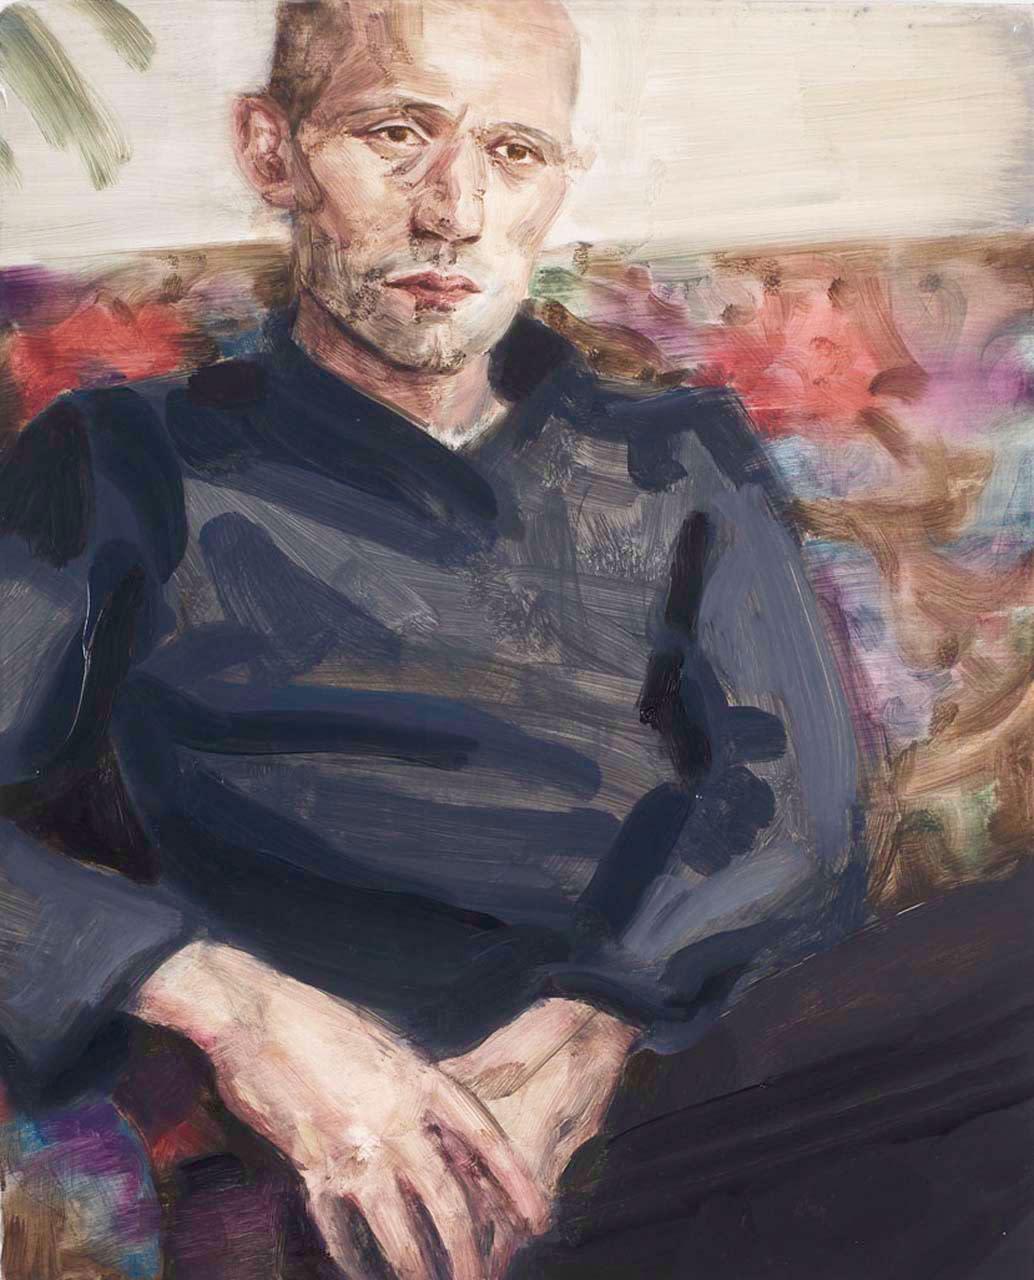 "<div class=""artwork_caption""><p>Michael Clark, 2009</p></div>"